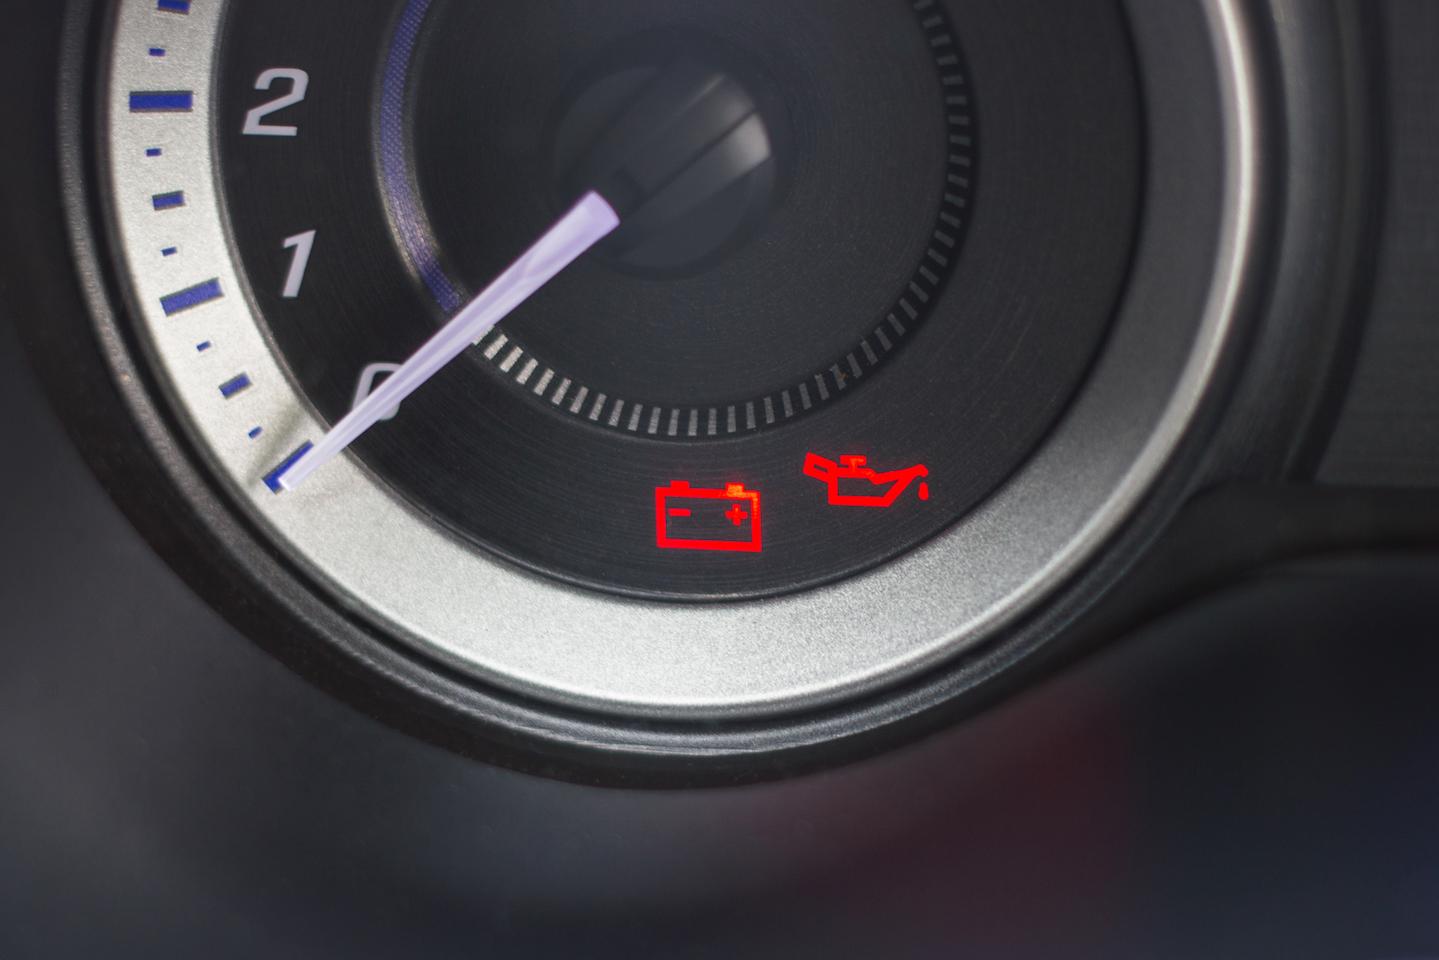 defective car battery